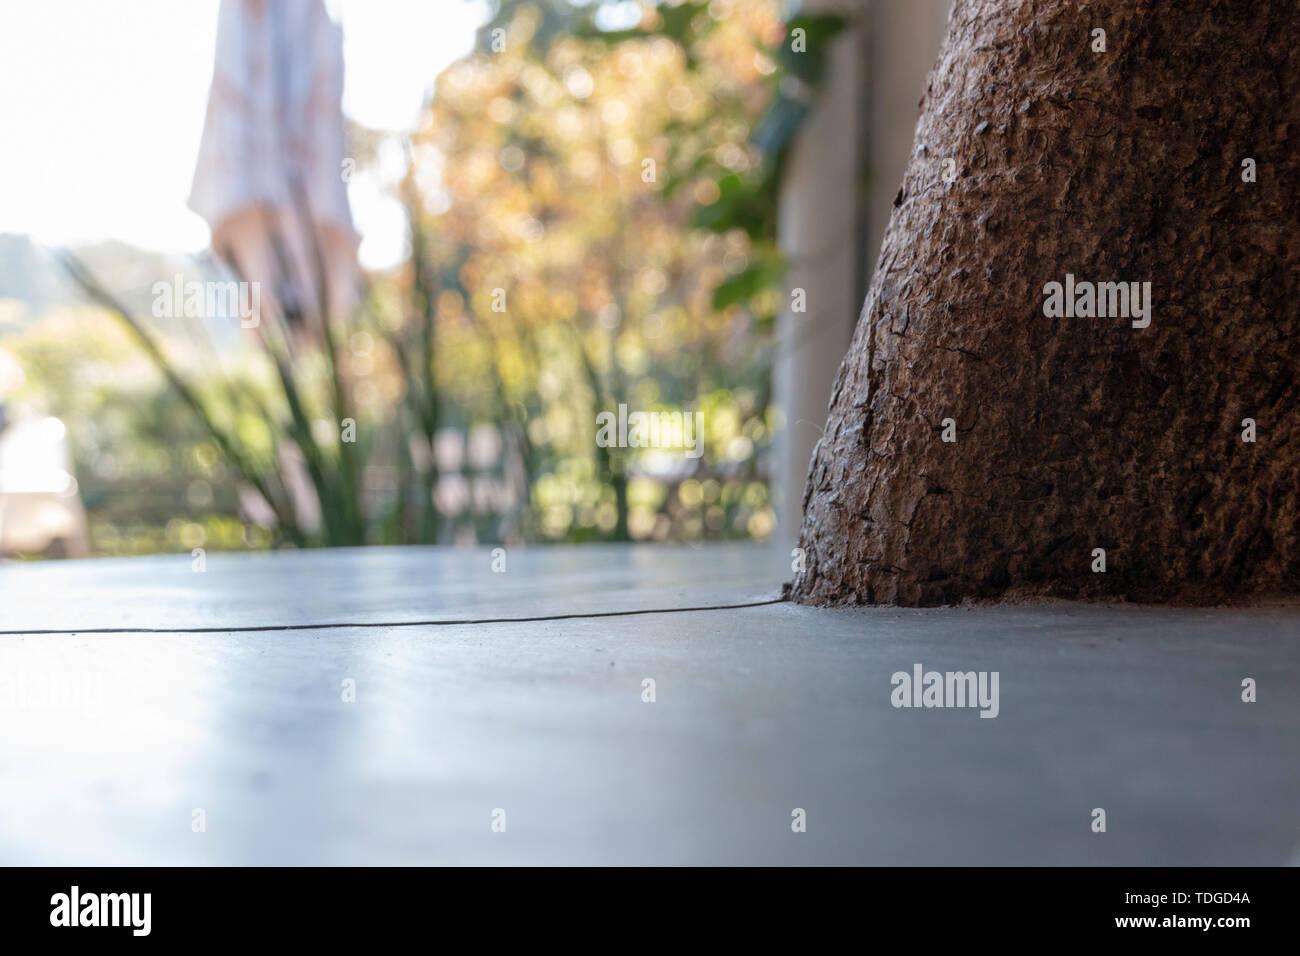 Relativ Glatte Betonoberfläche Stockfotos & Glatte Betonoberfläche Bilder UY48